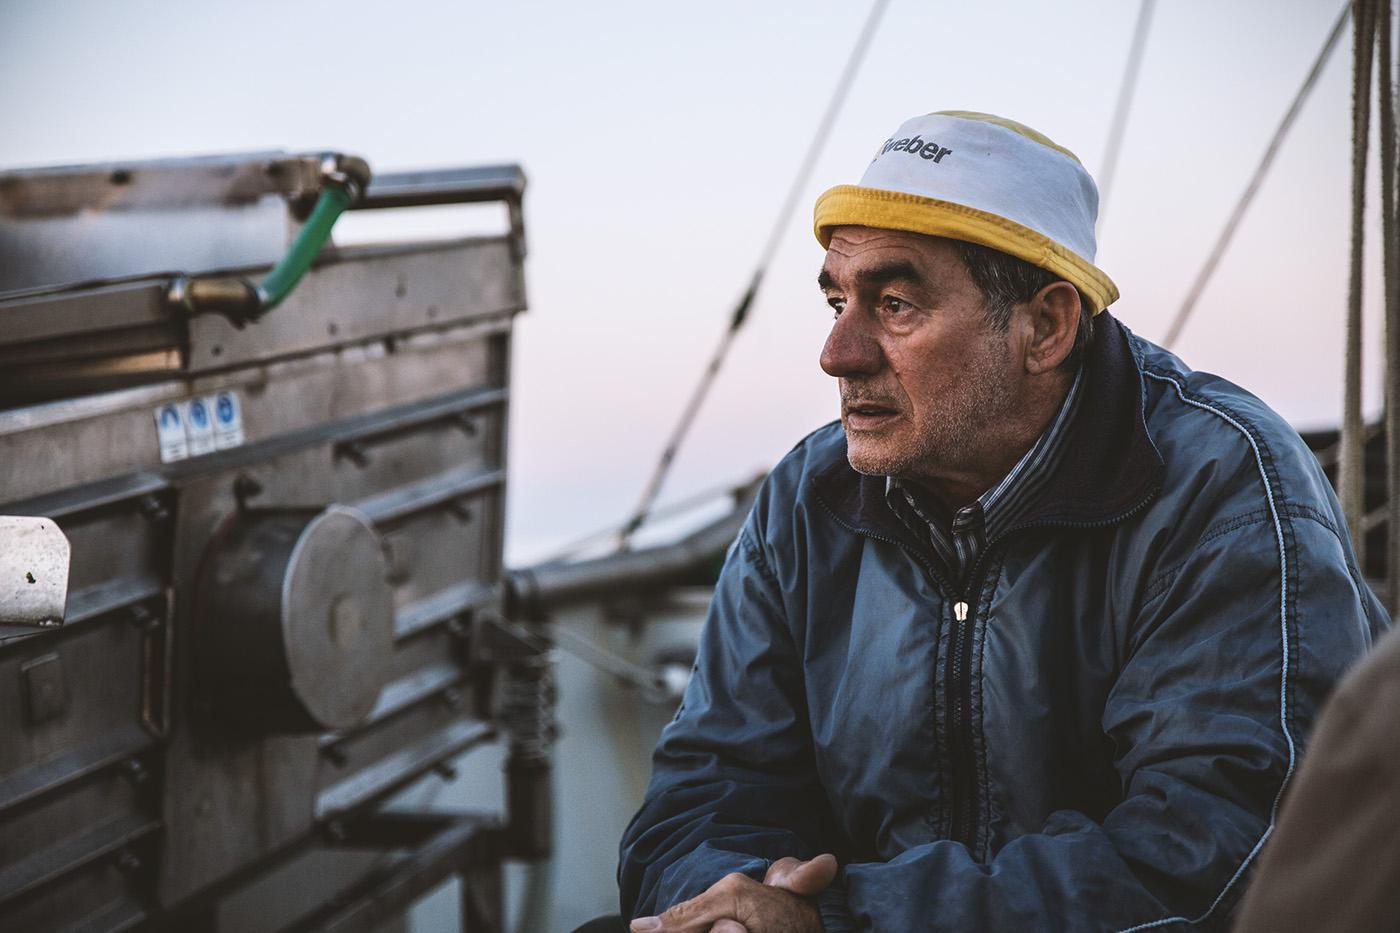 Food  foodphotography sea seafood spaghetti fishing fish foodplate foodshooting